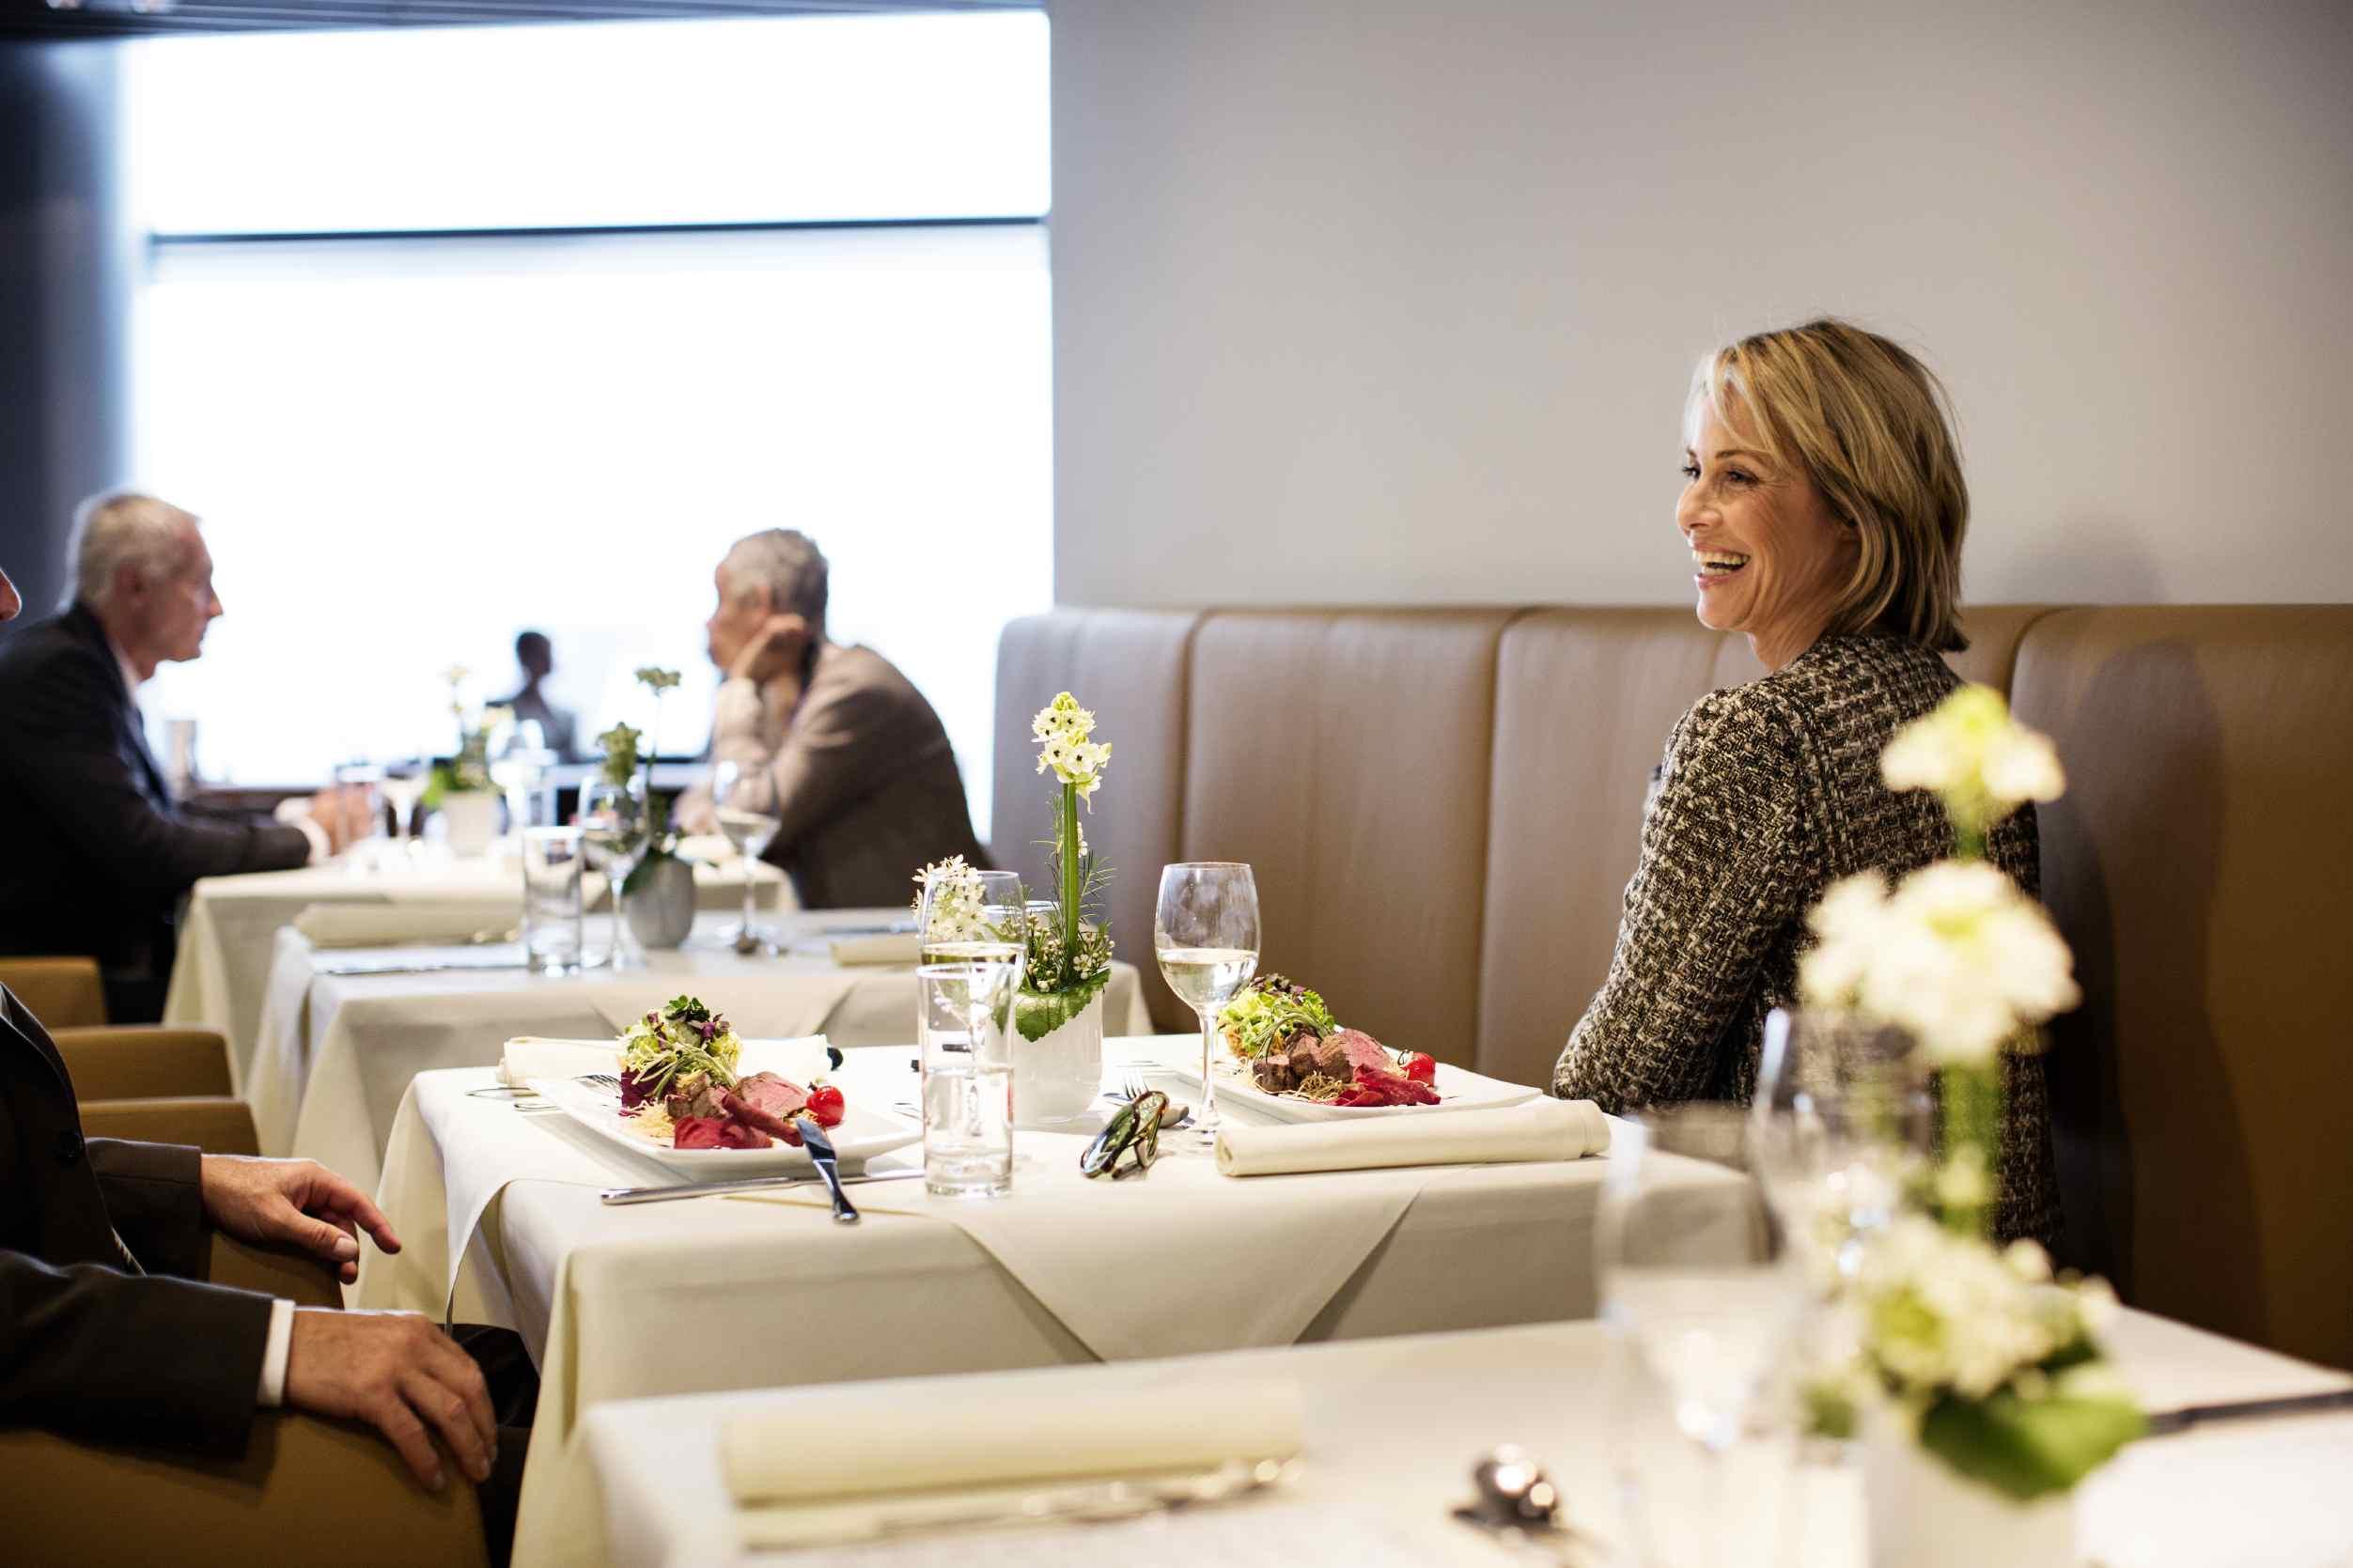 Lufthansa first class pre-departure meal